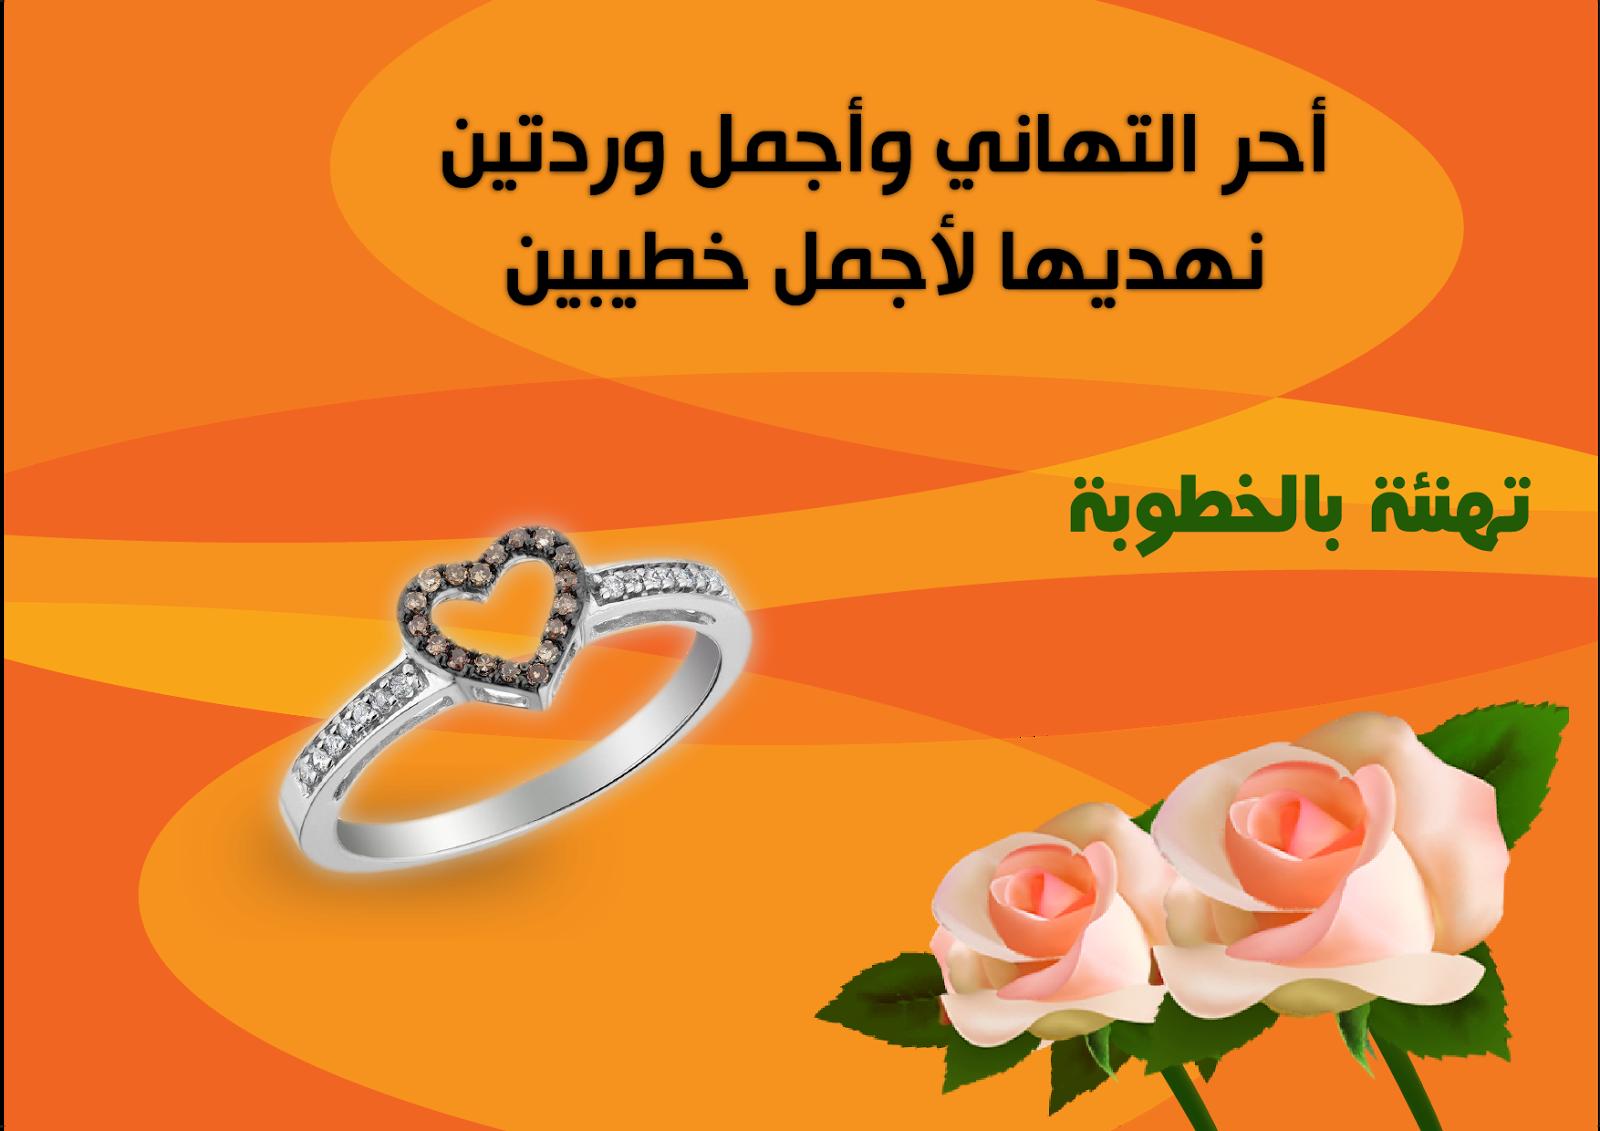 صور عن الخطوبه 2020 بوستات خطوبه بالصور Engagement Engagement Rings Wedding Rings